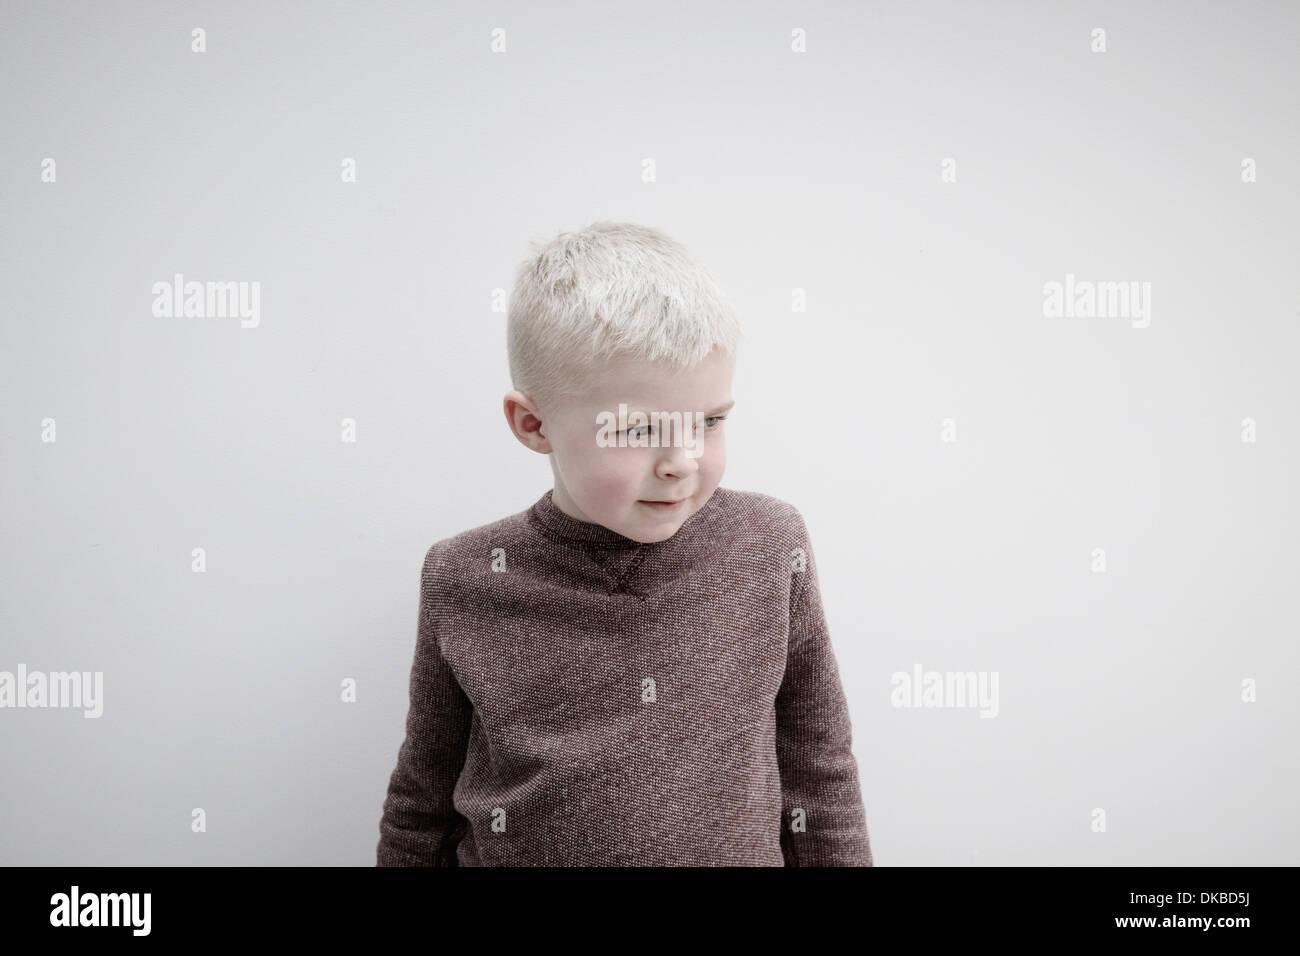 Portrait of boy wearing brown jumper, looking away - Stock Image